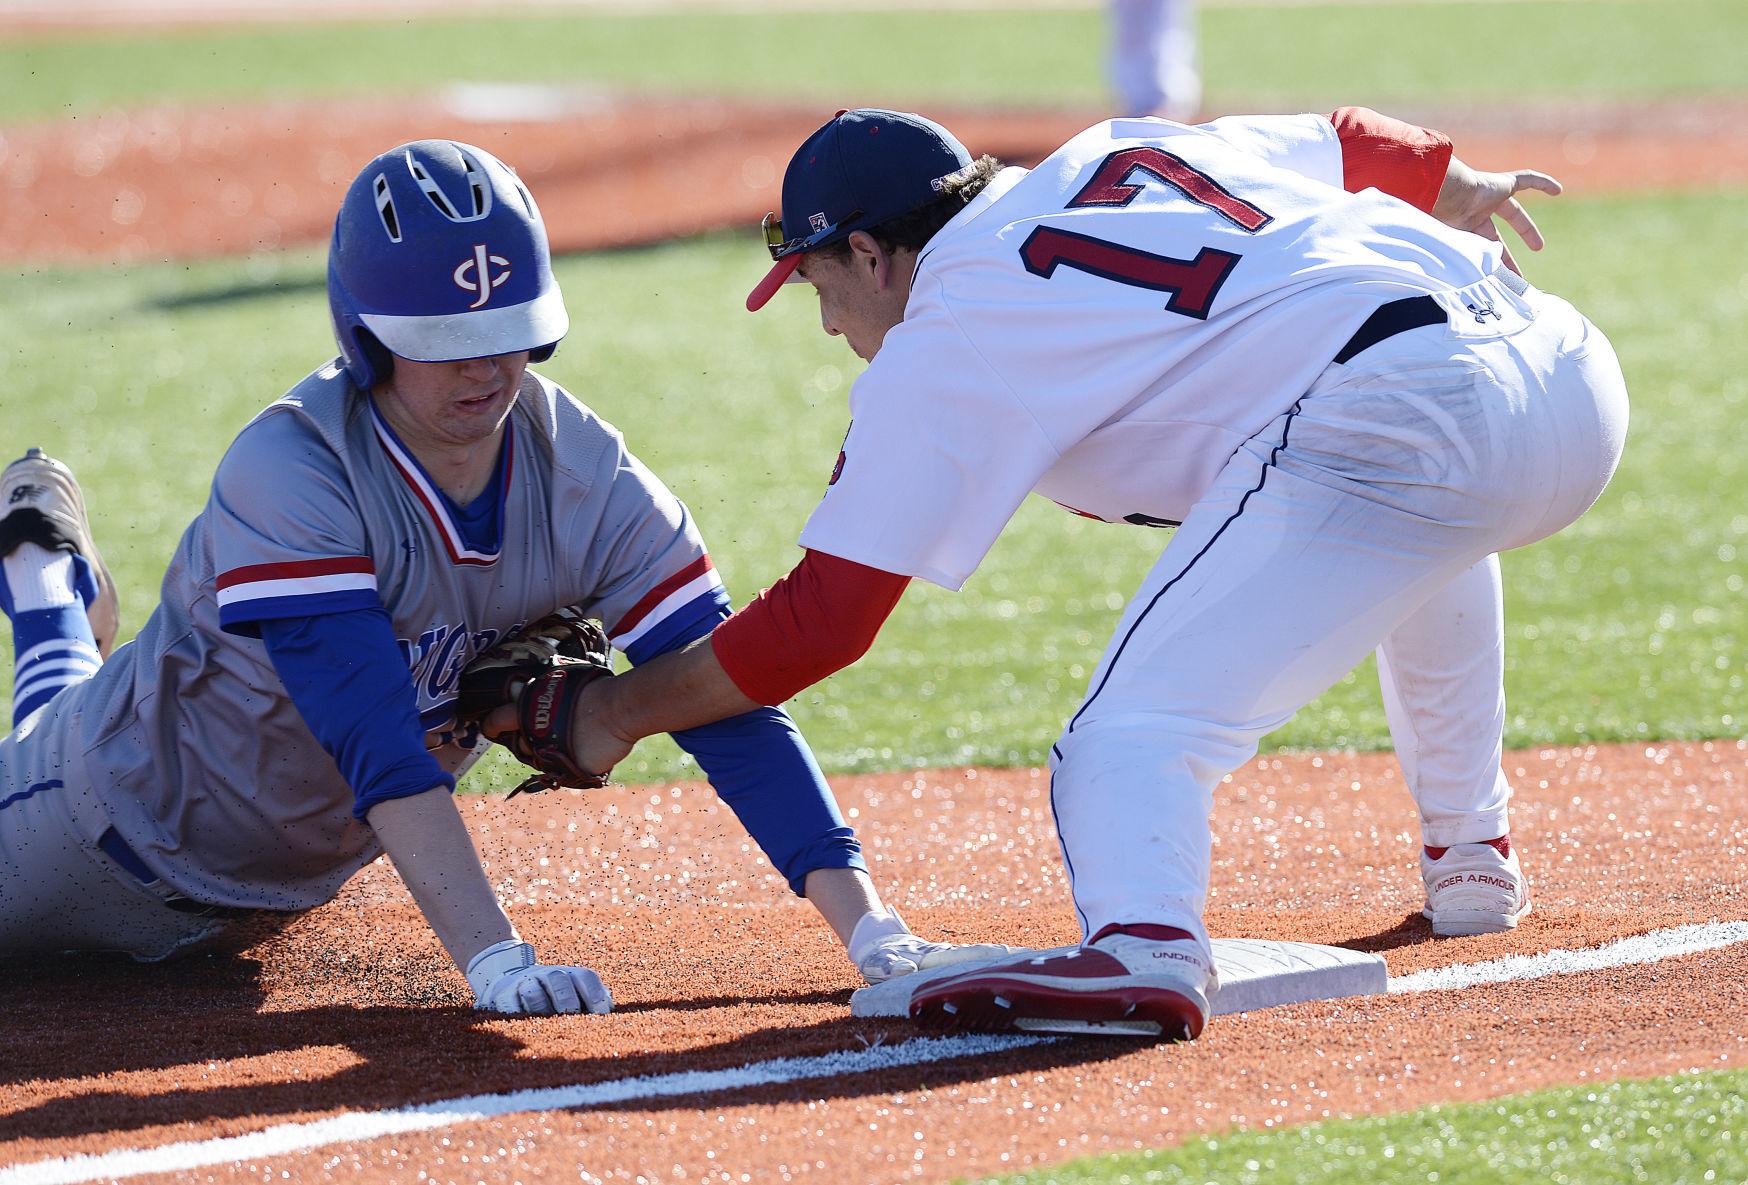 WIAA state baseball photo: Sun Prairie's Liam Moreno